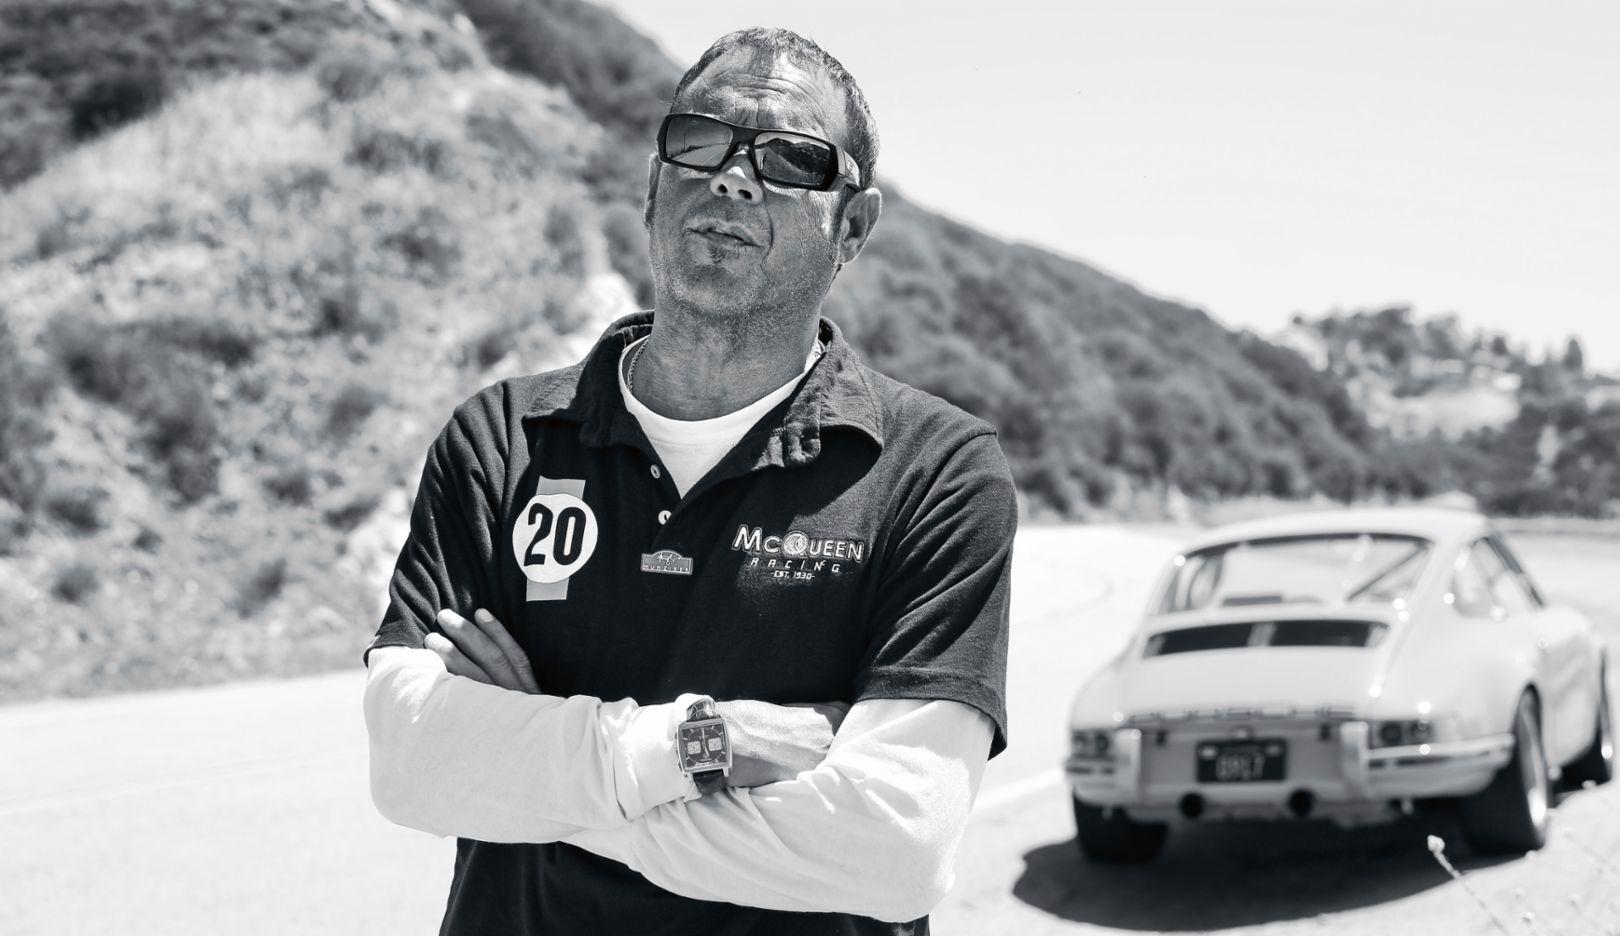 Chad McQueen, 2017, Porsche AG